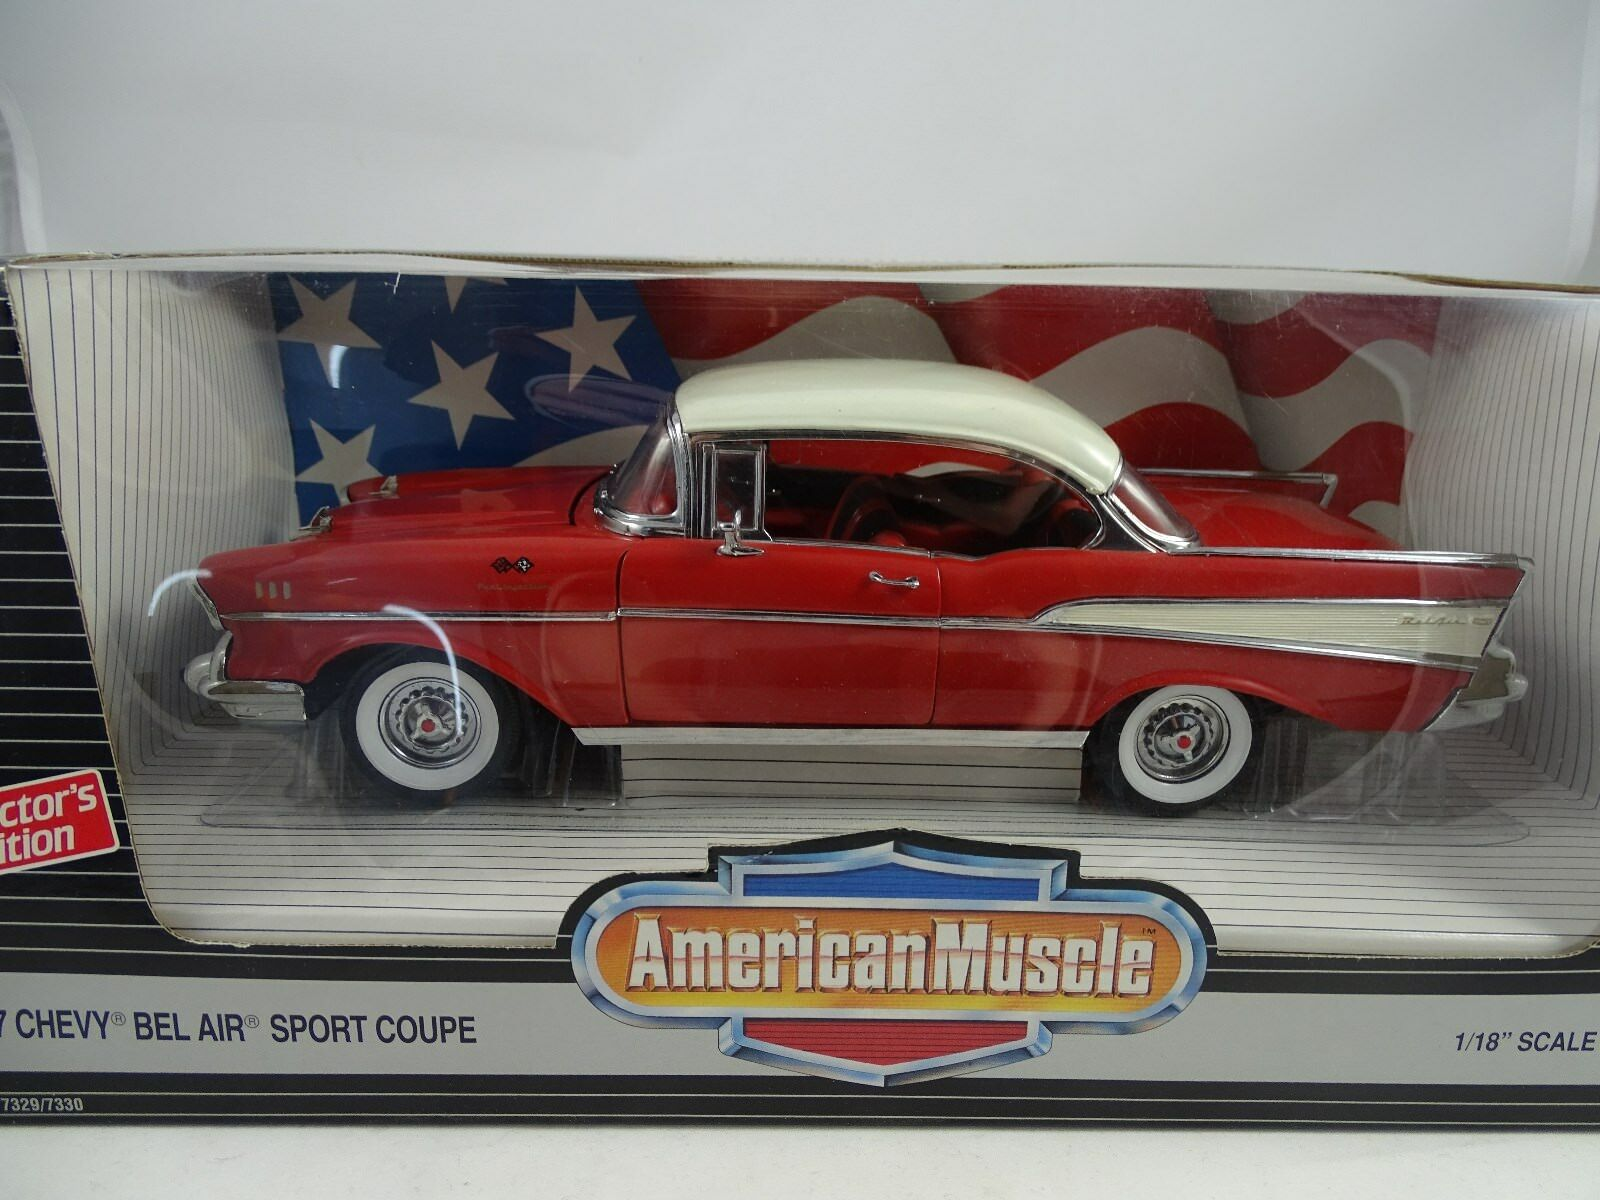 1 18 ertl Chevy Bel Air Sport Coupe rosso bianca-rareza